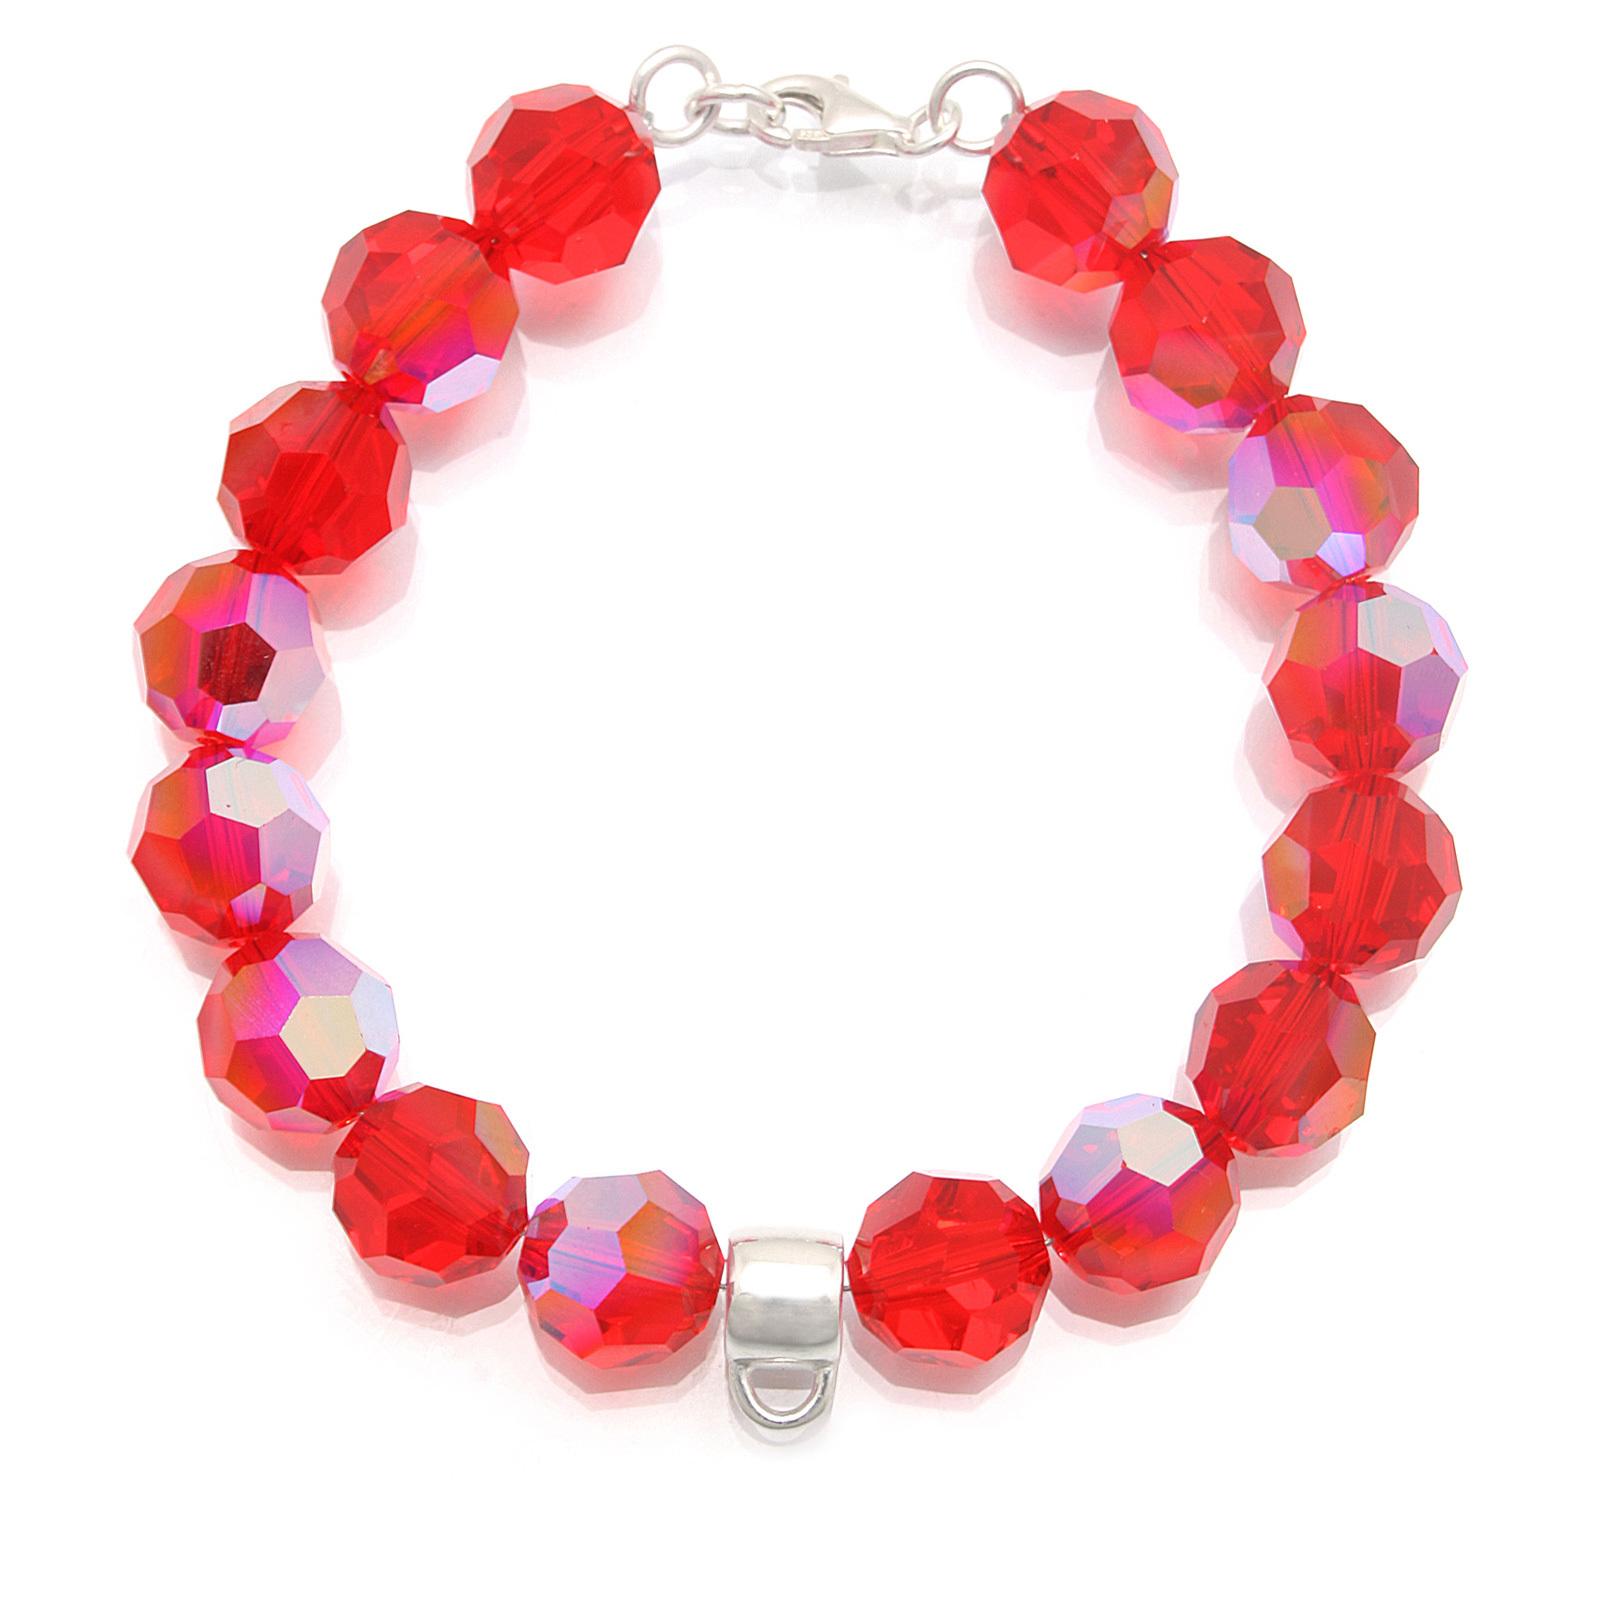 Beads Kristalle 925 Sterling Silber